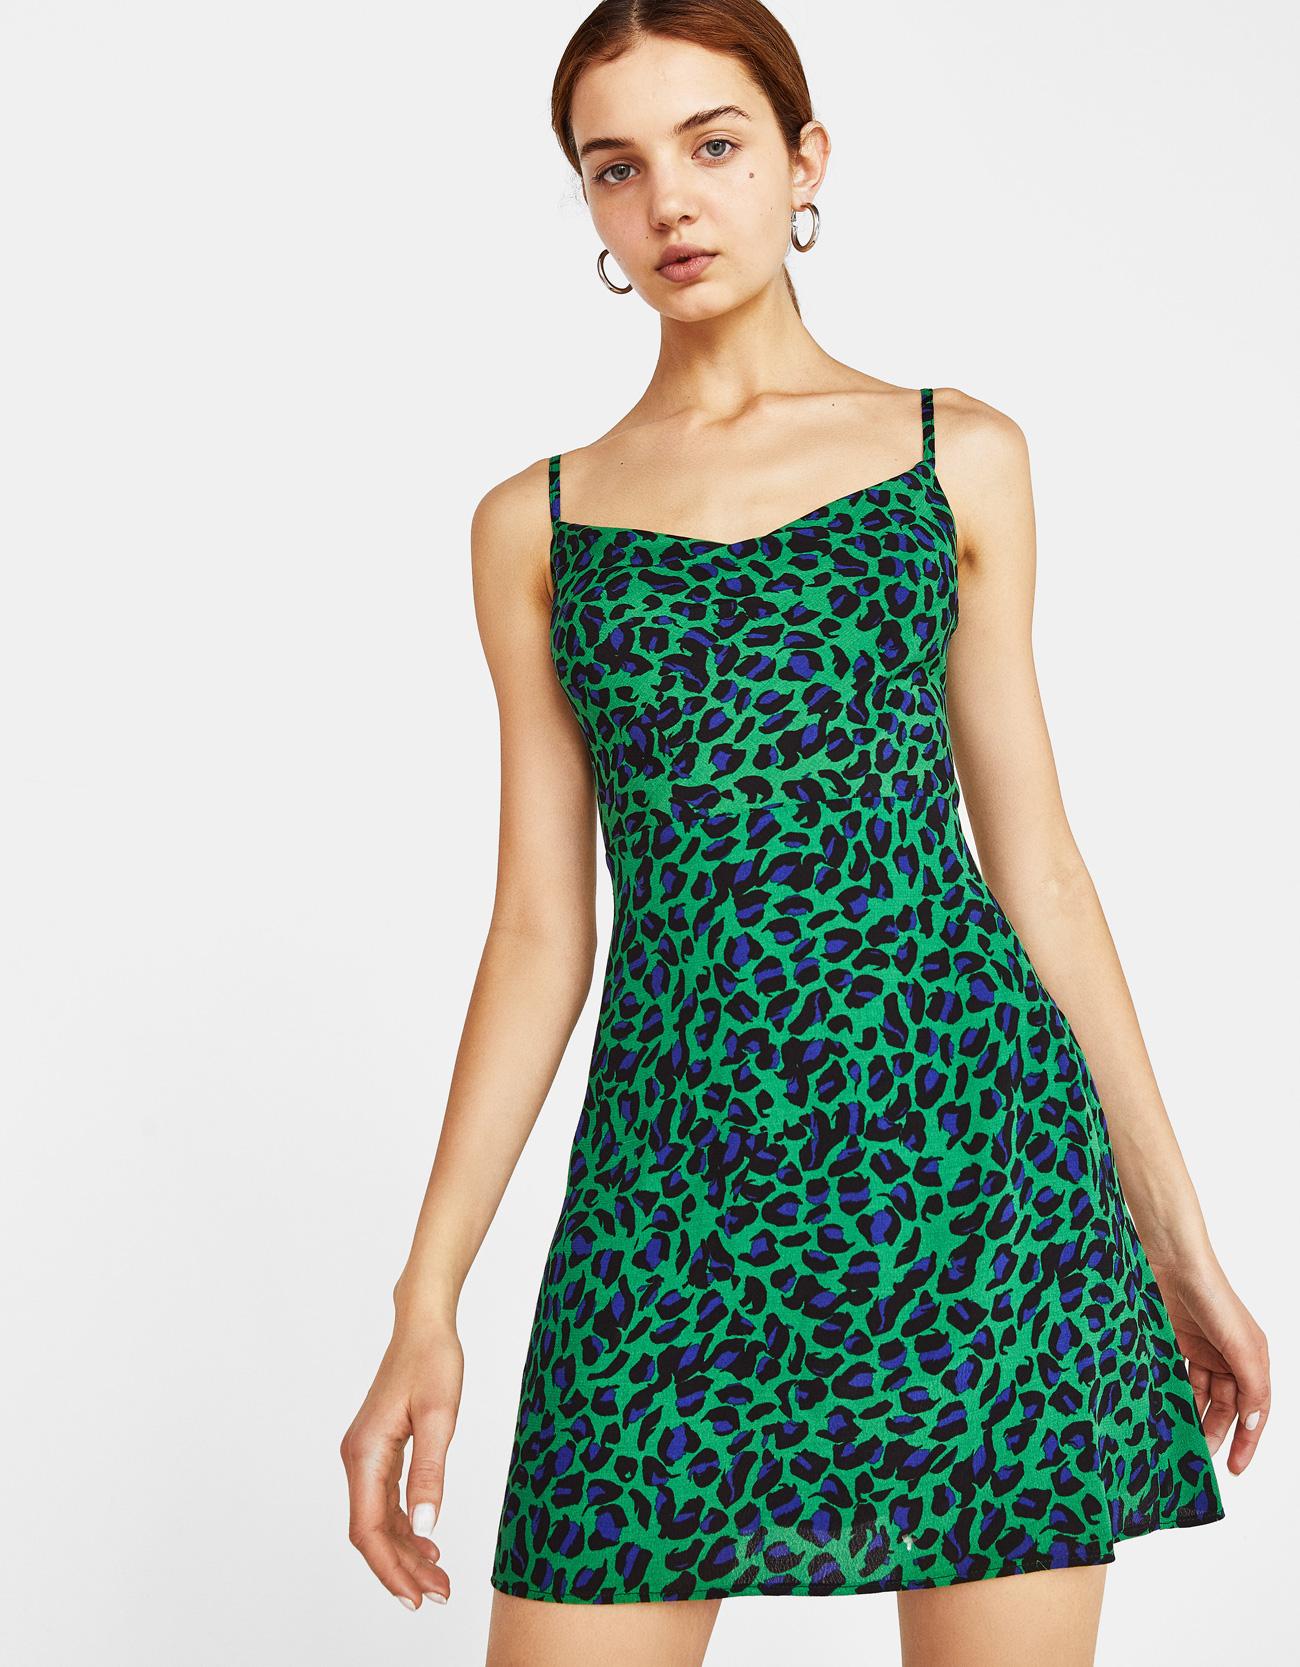 H M - 5990 Ft. kek-zold leopardmintas ruha bershka.jpg ece0140e8e